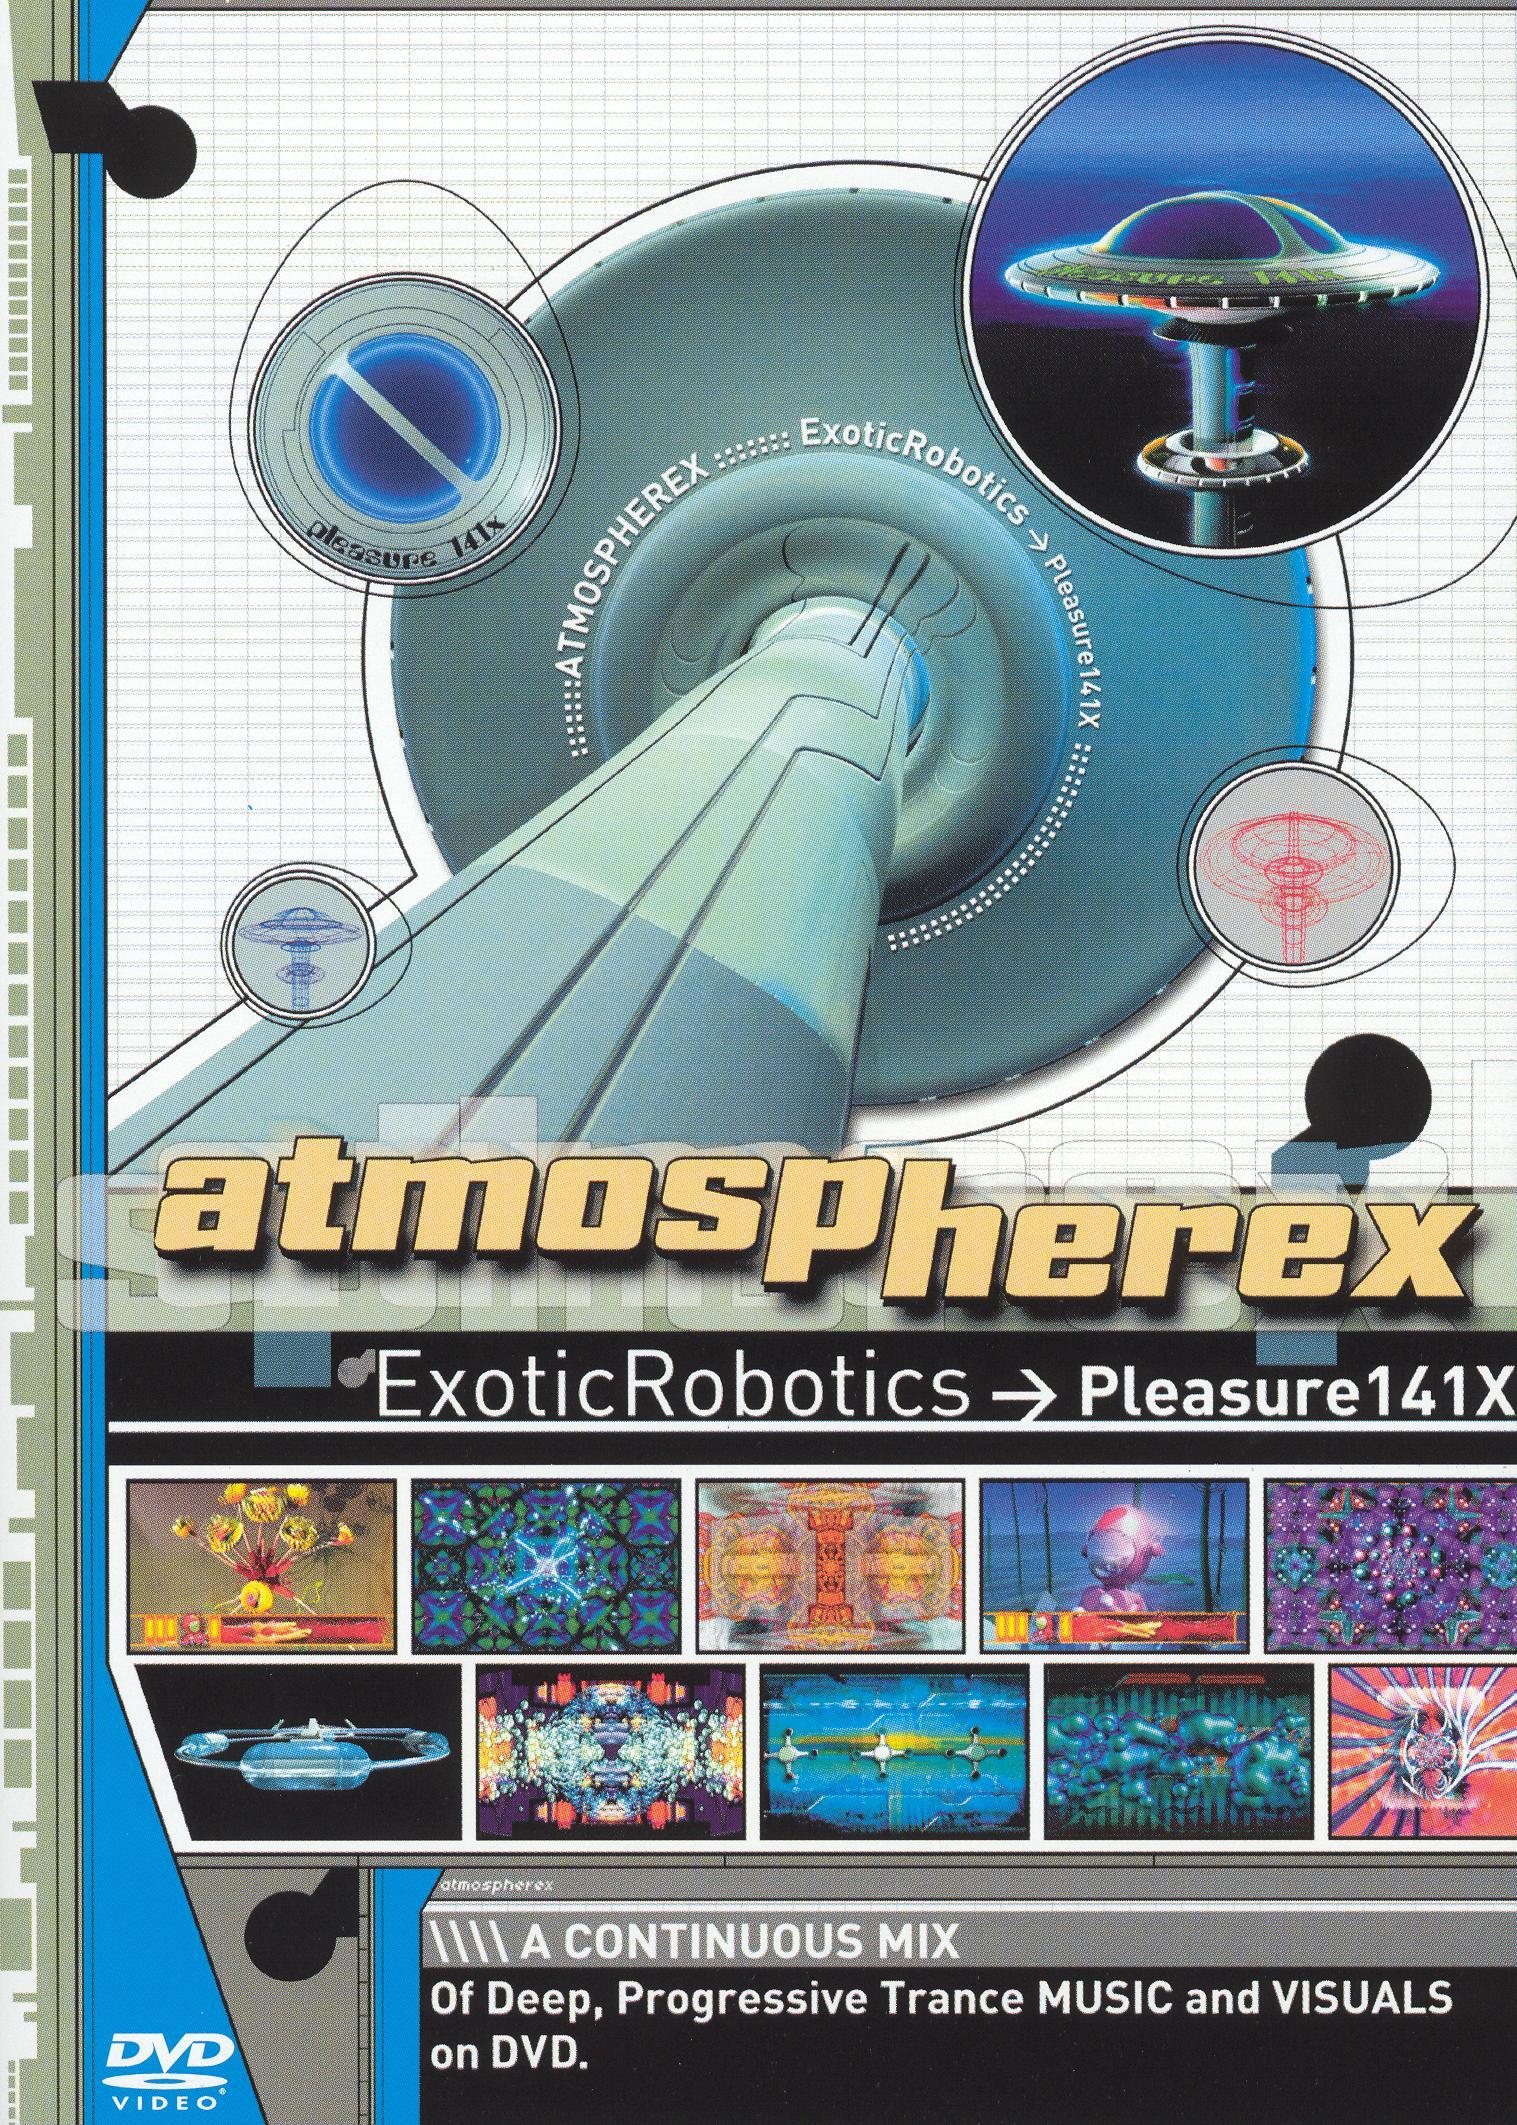 Atmospherex: Exotic Robotics - Pleasure 141X